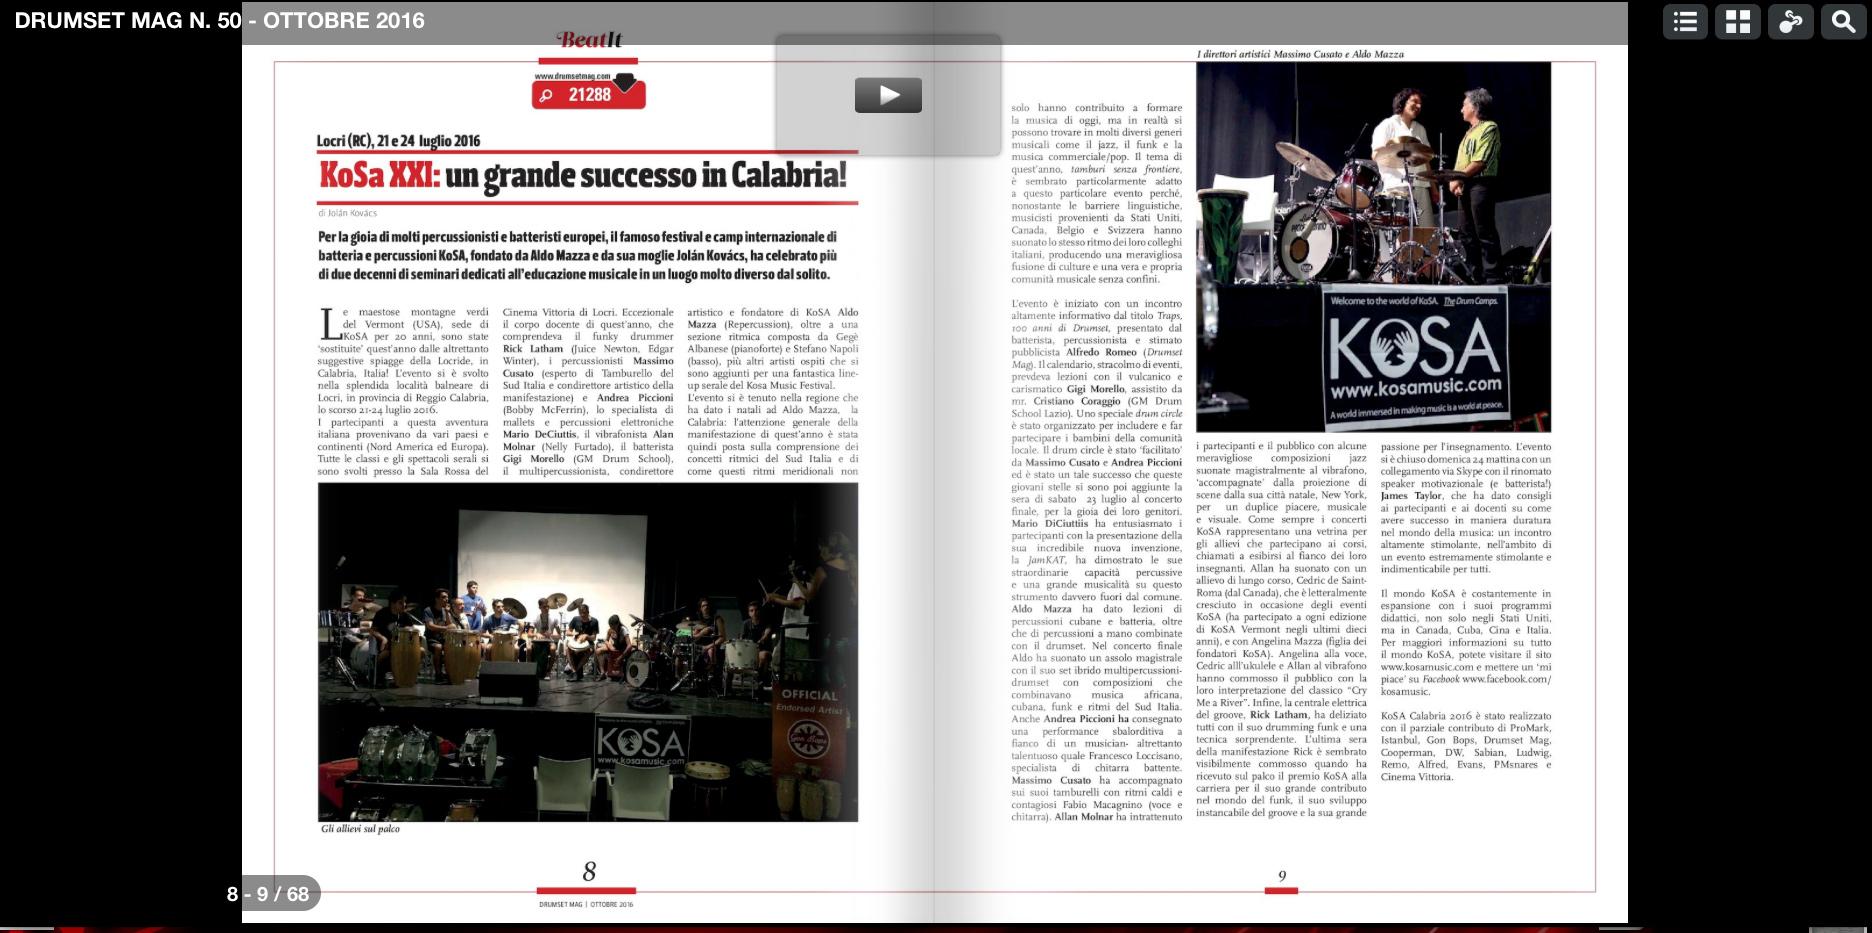 articolo-kosa-calabria-drumsetmag-sett-2016-2016-10-13-15-15-46